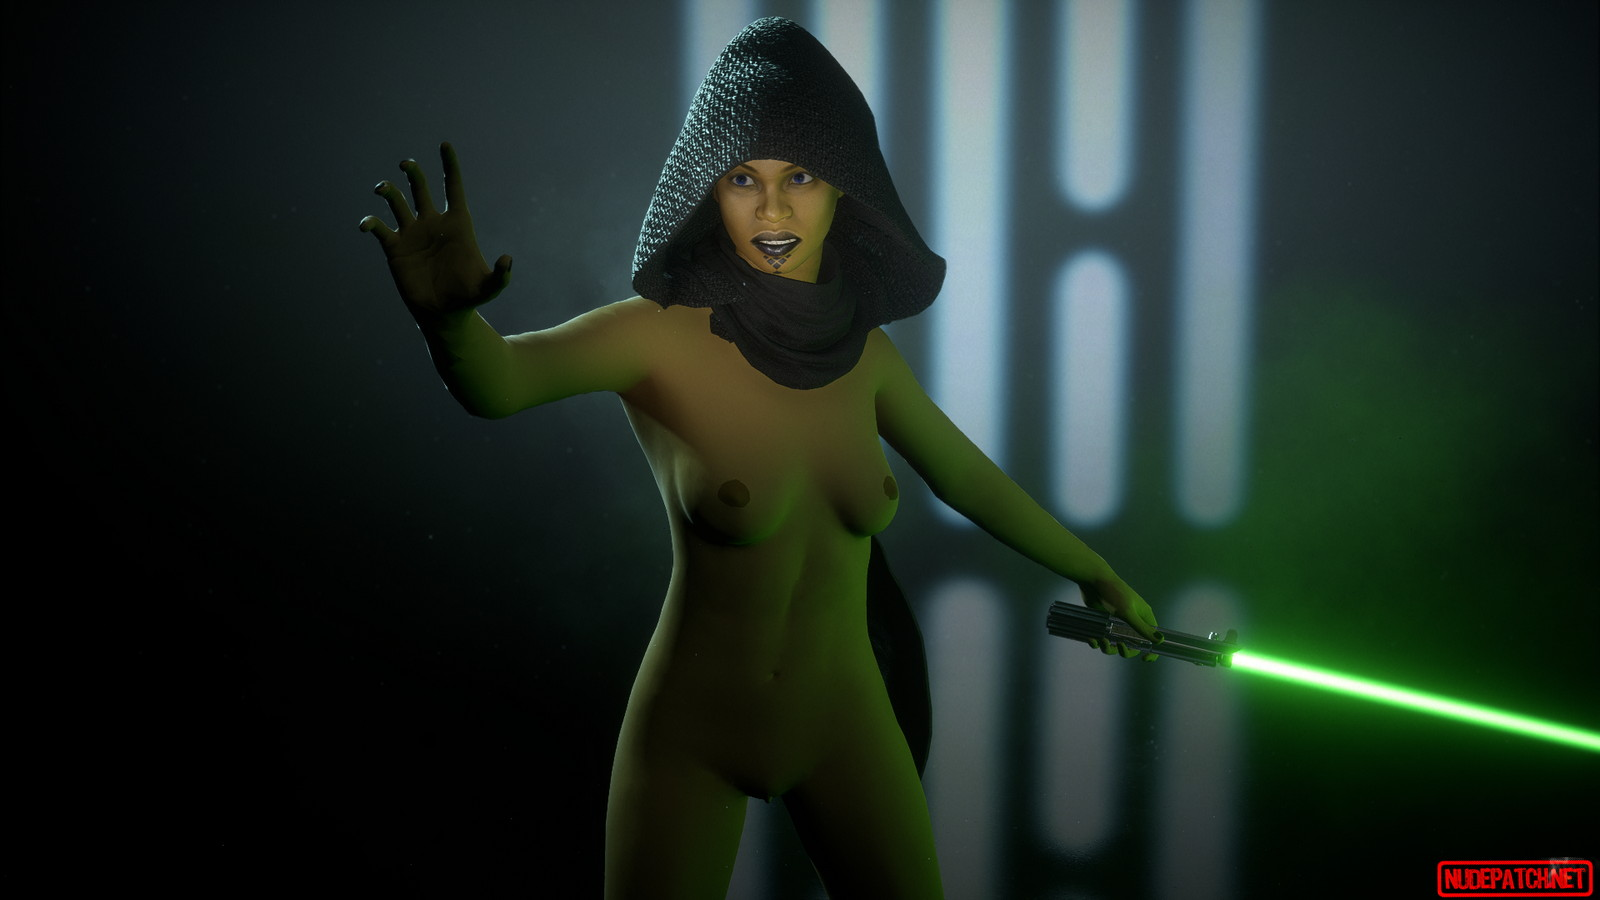 Naked star wars